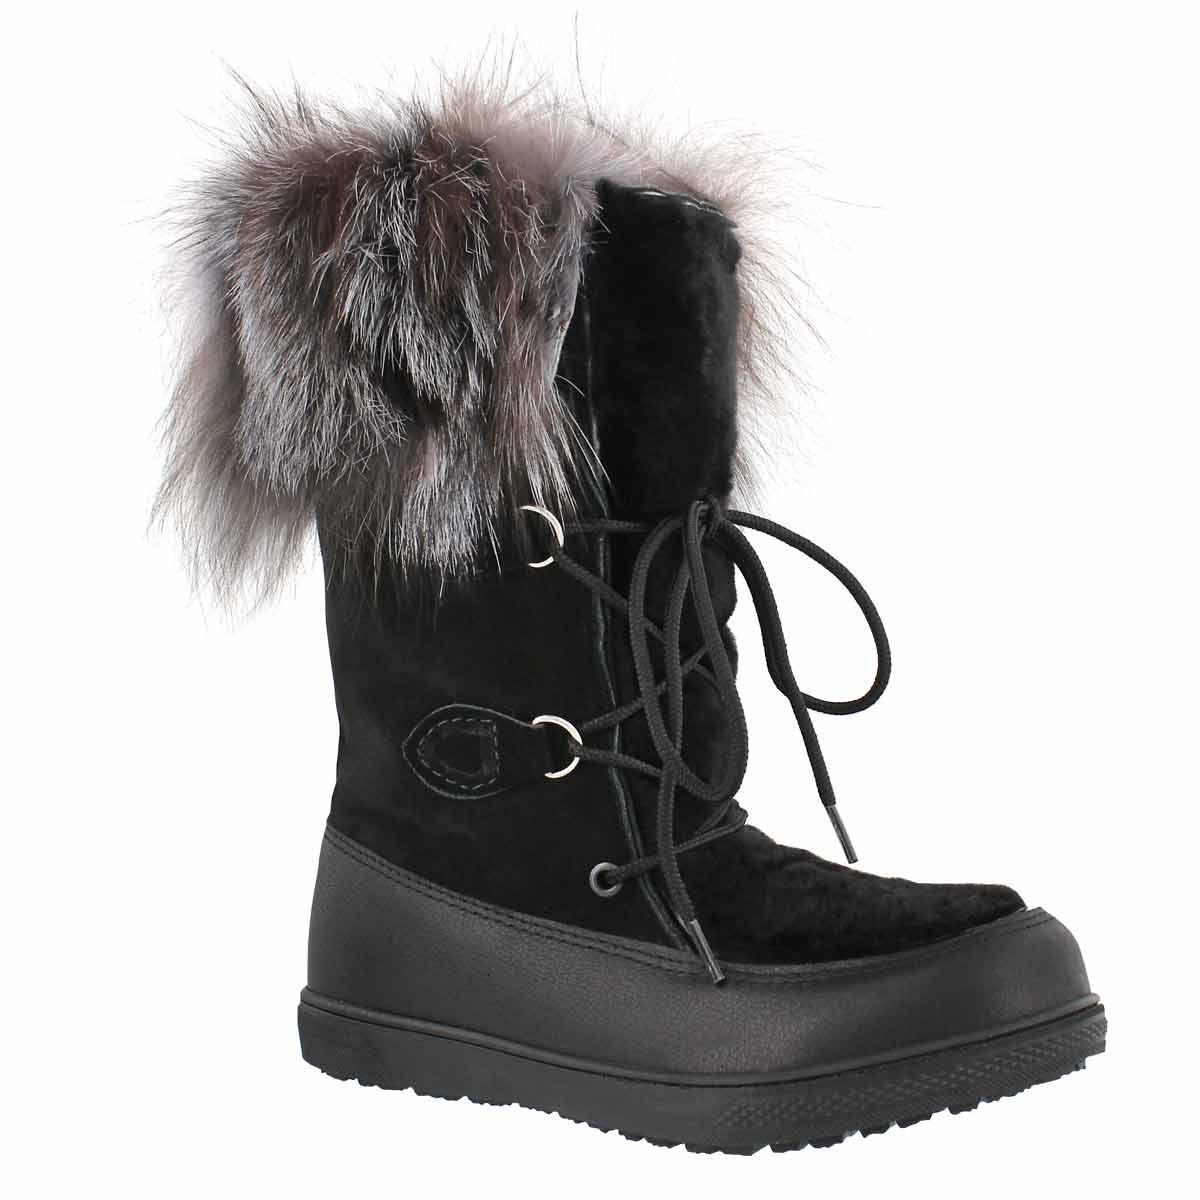 Women's FREDERICA black fox fur mukluks